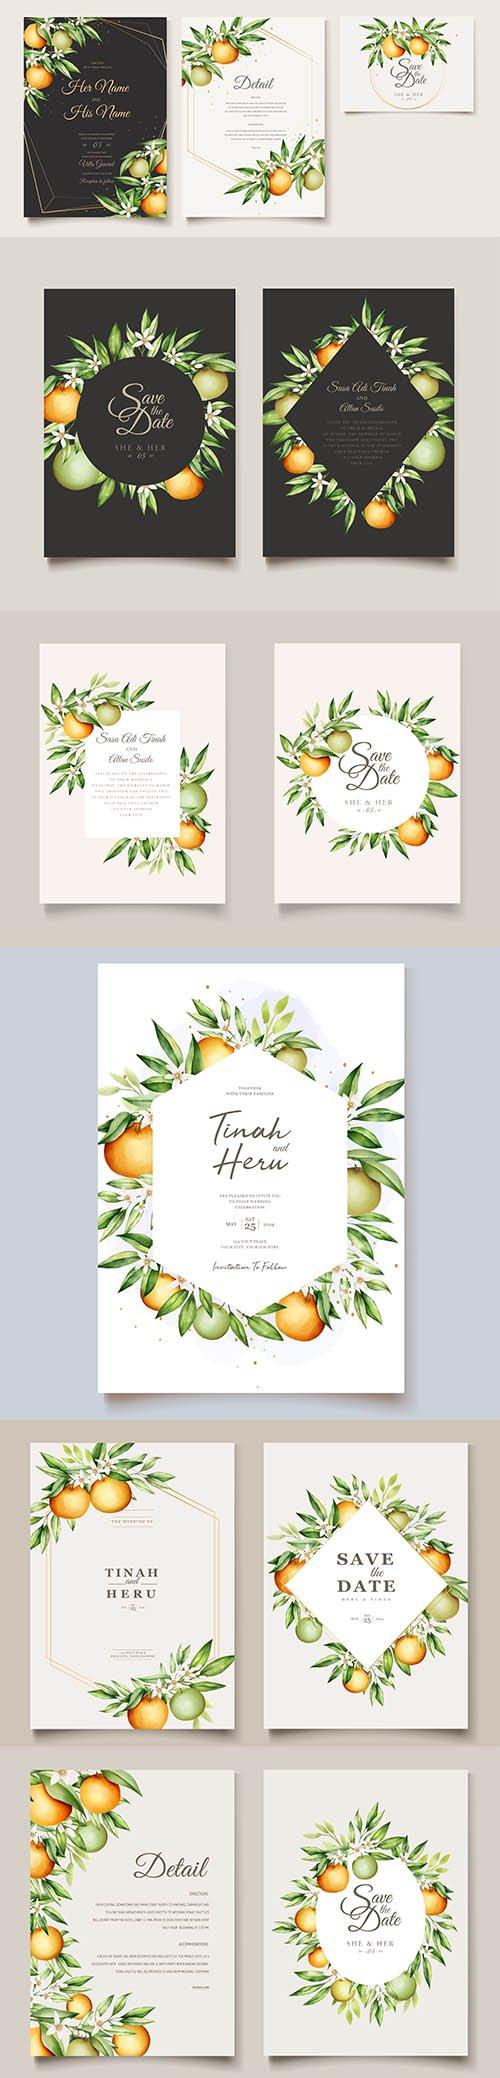 Botanical Watercolor Wedding Invitation Card Template